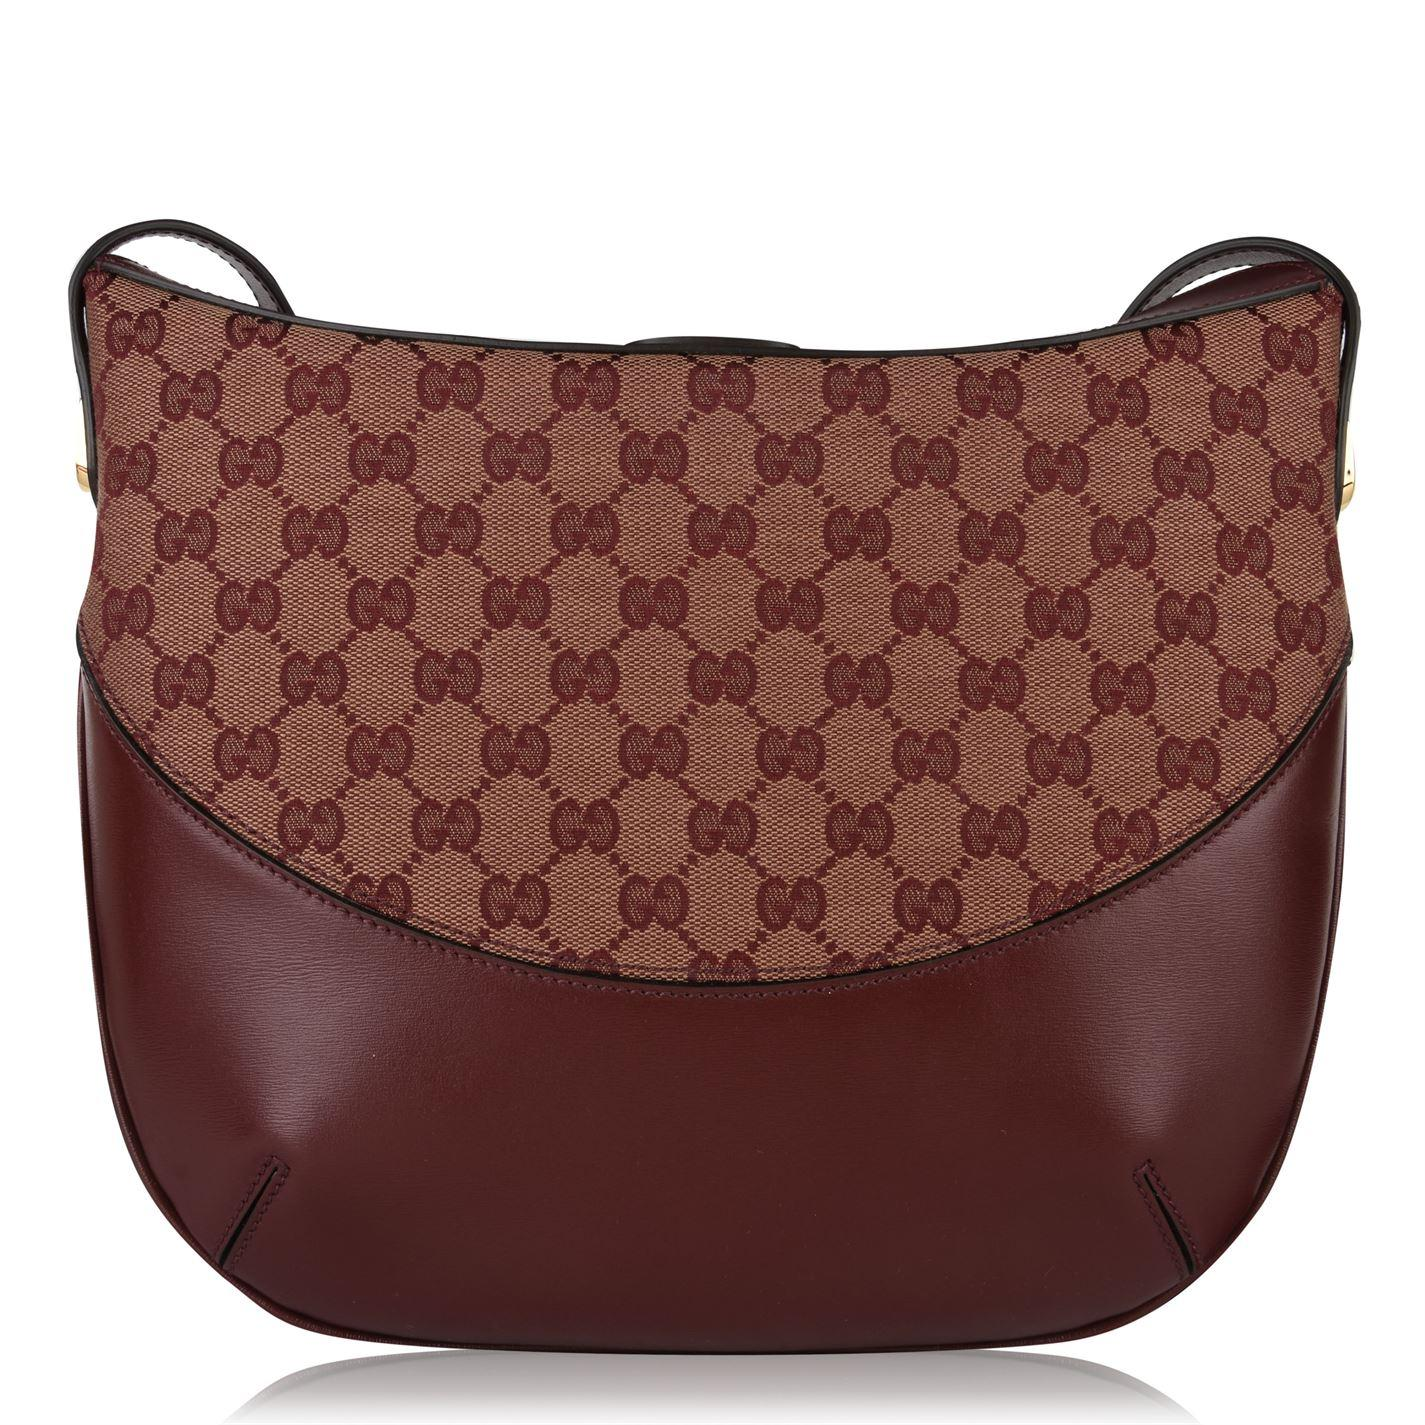 84f893a81 Gucci - Brown Arli Gg Shoulder Bag - Lyst. View fullscreen